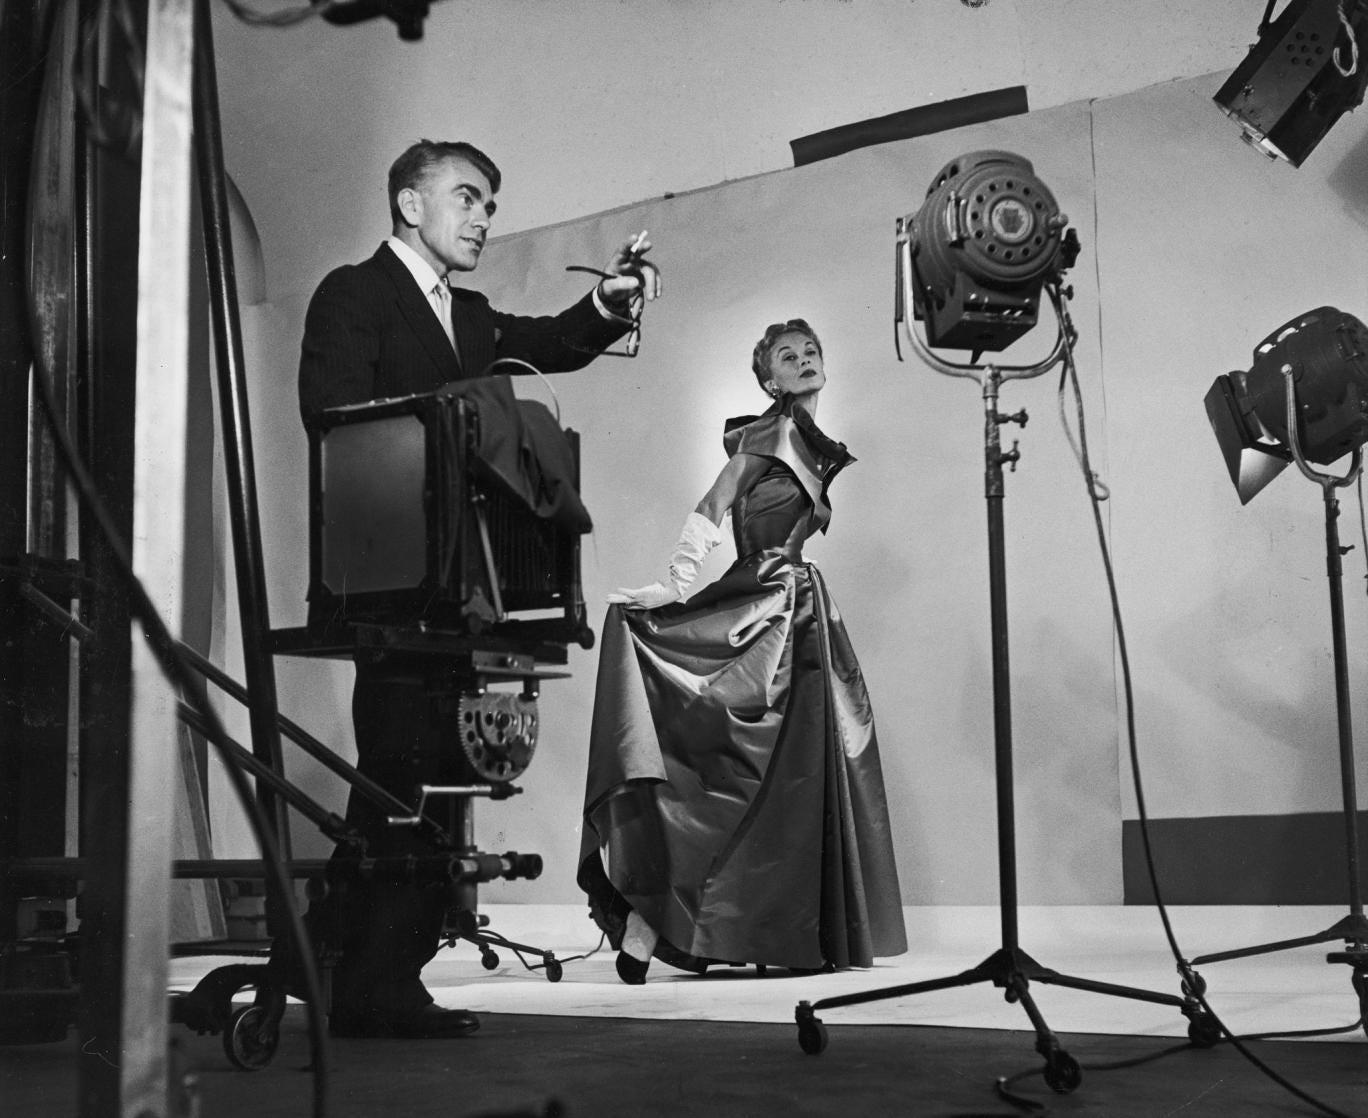 Horst P Horst mid-fashion shoot in New York, 1949